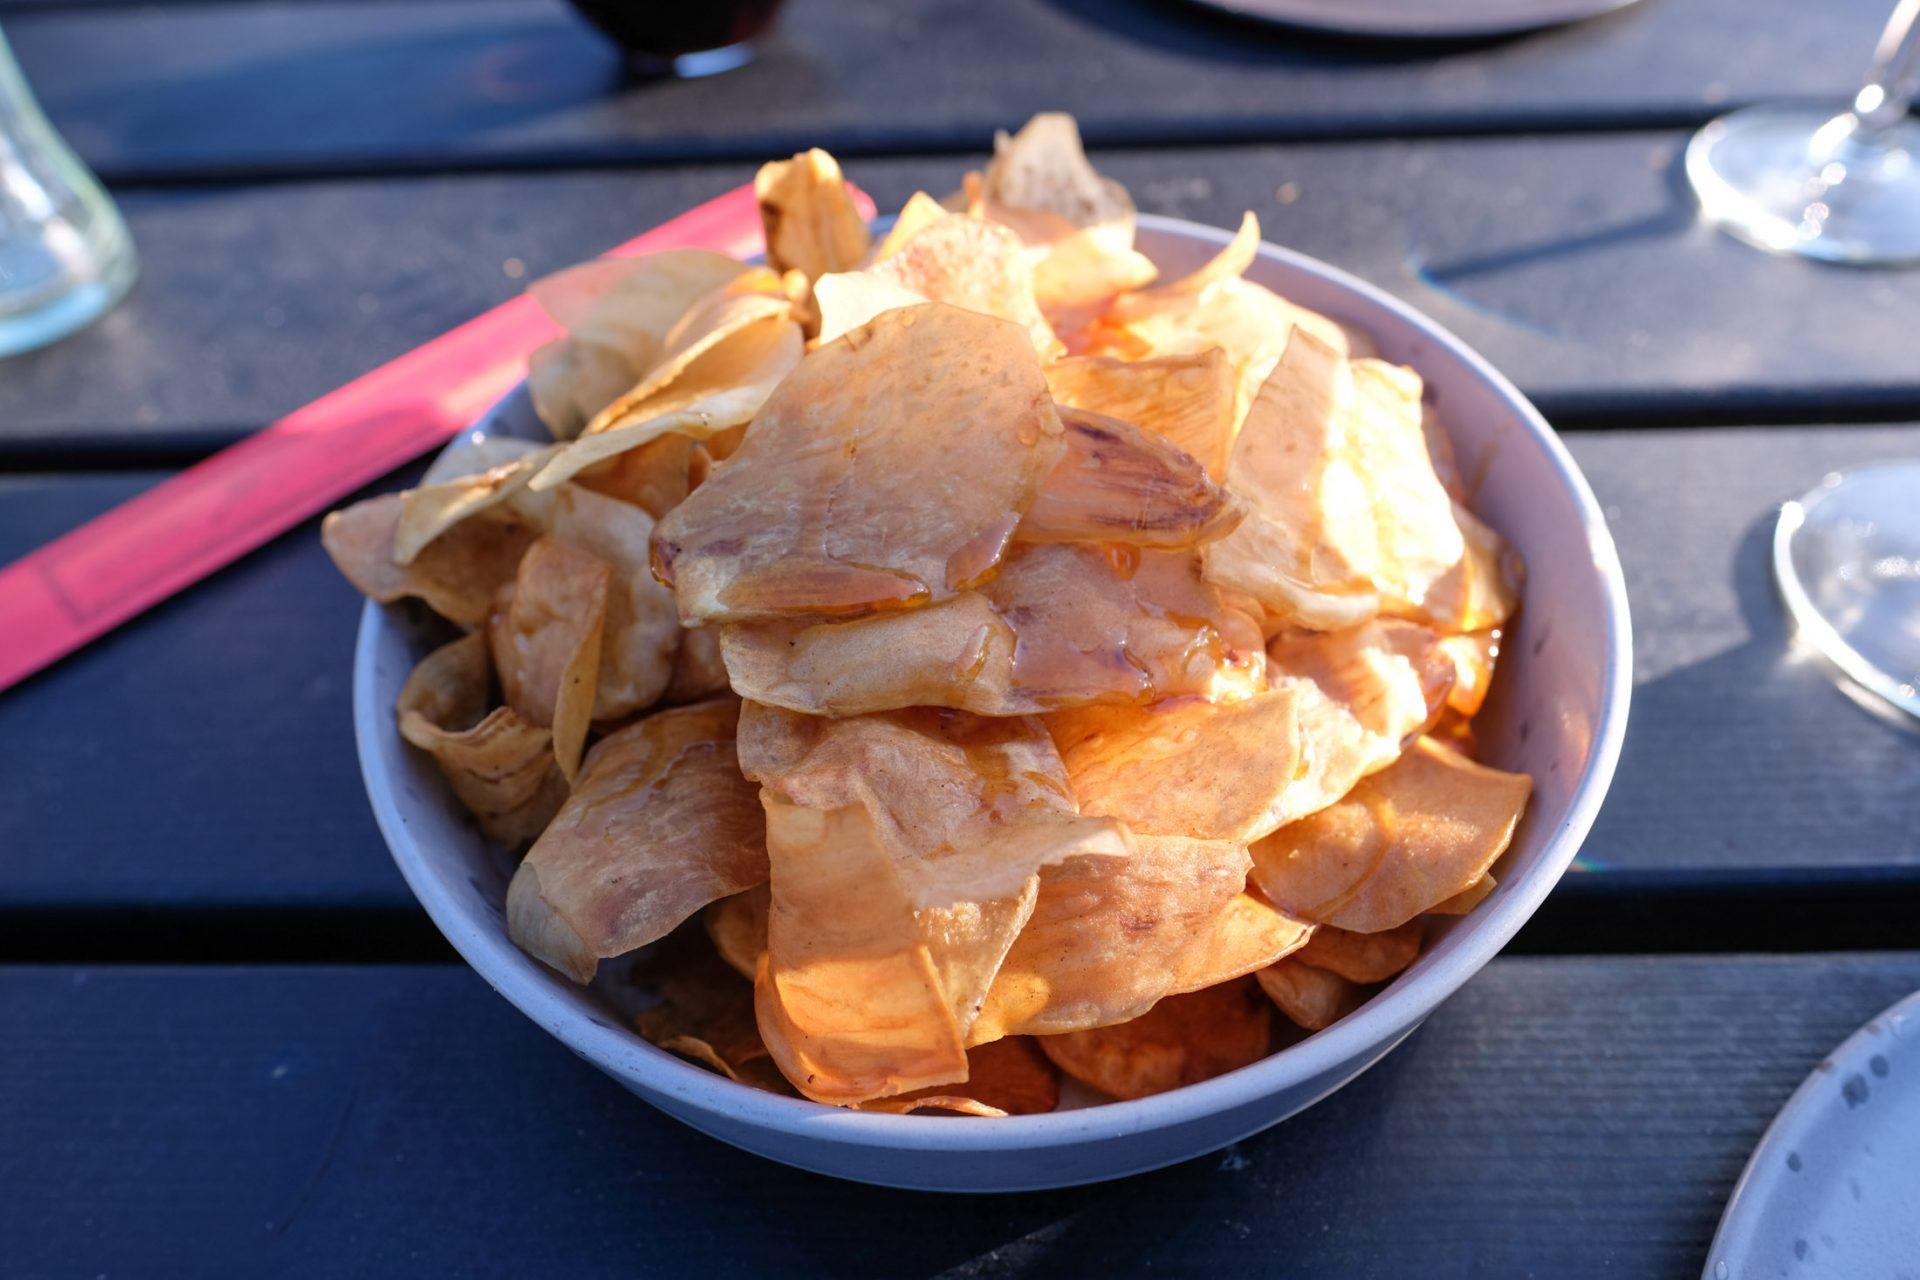 Neem Deli: Asiatisk fusionskøkken med store portioner og gode priser